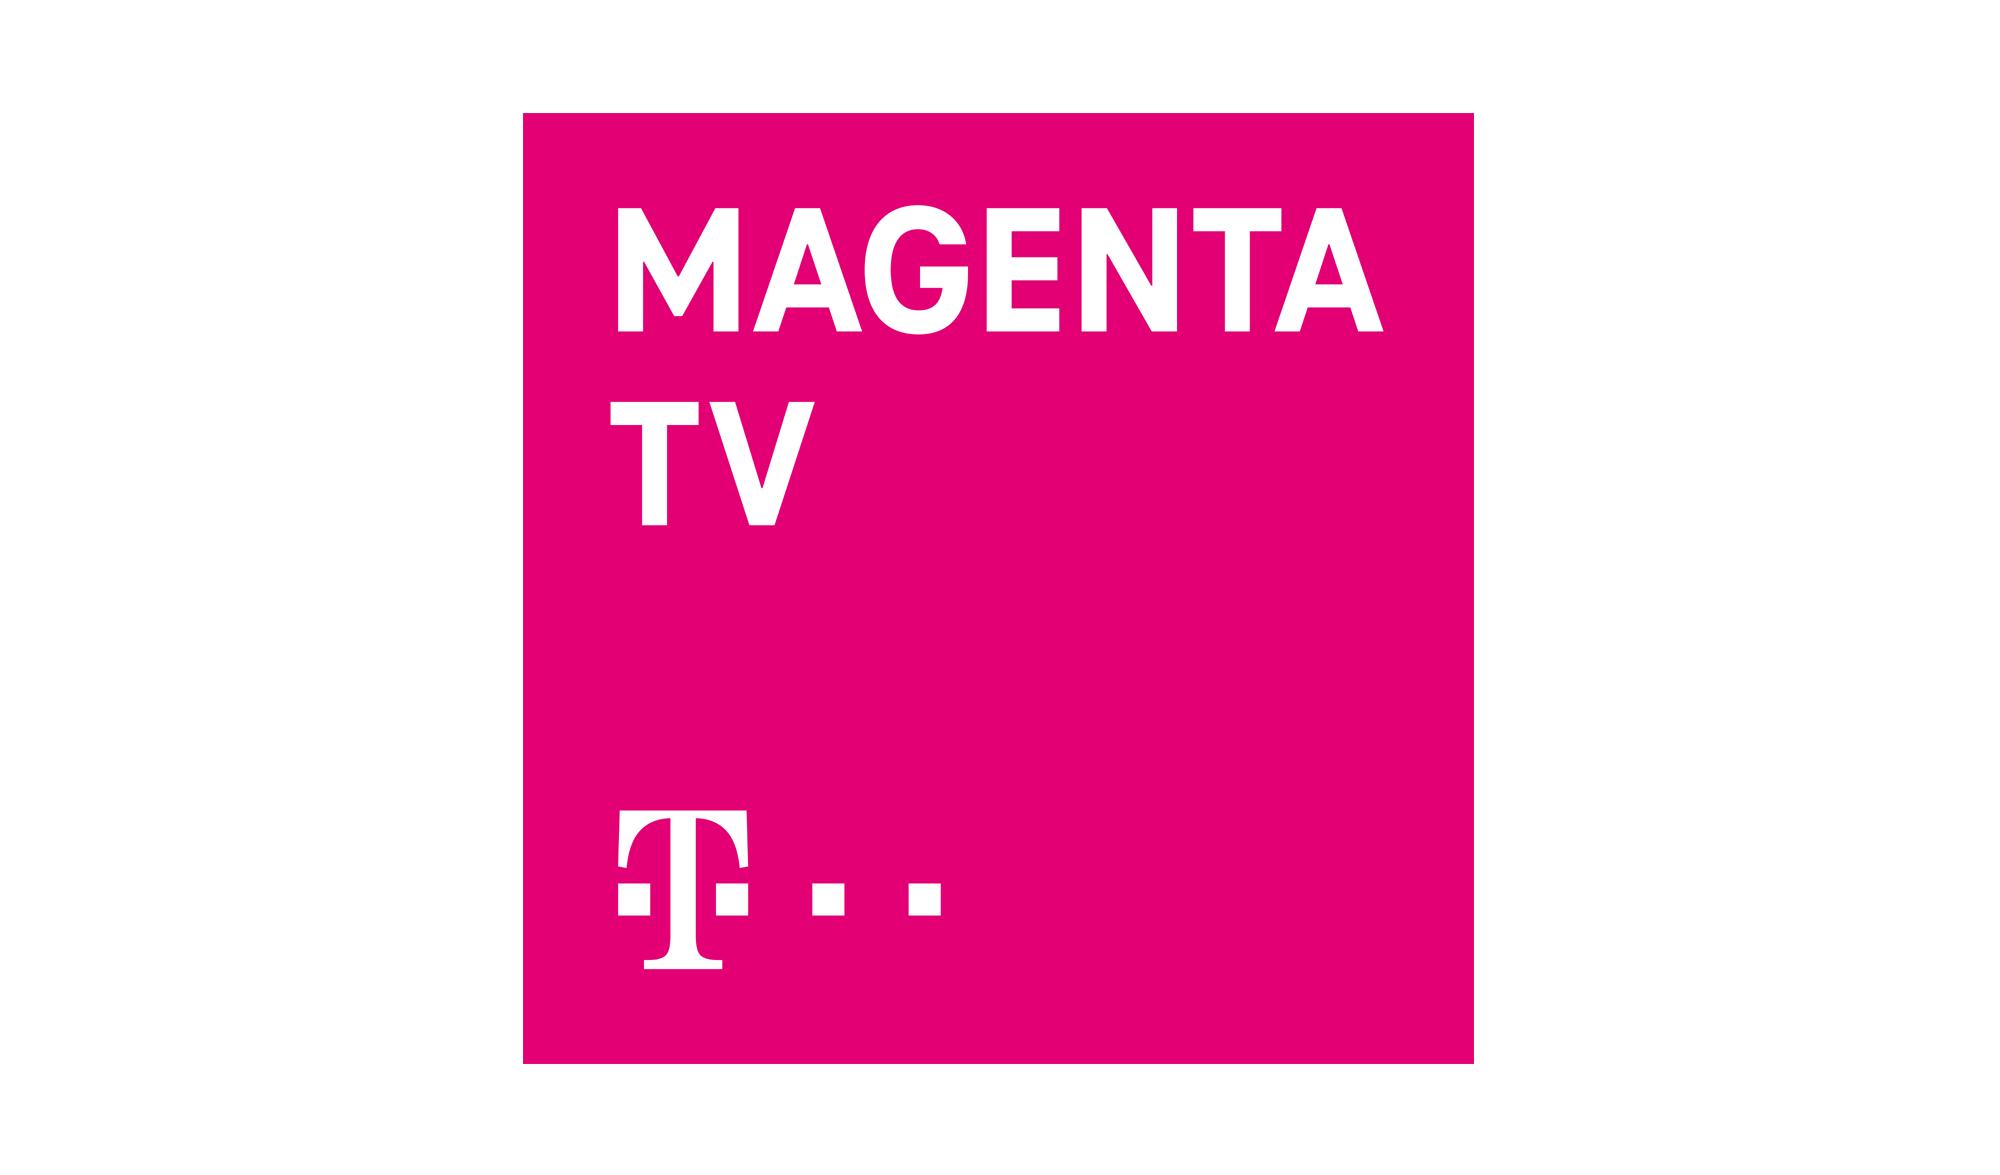 MagentaTV Smart 3 Monate kostenlos